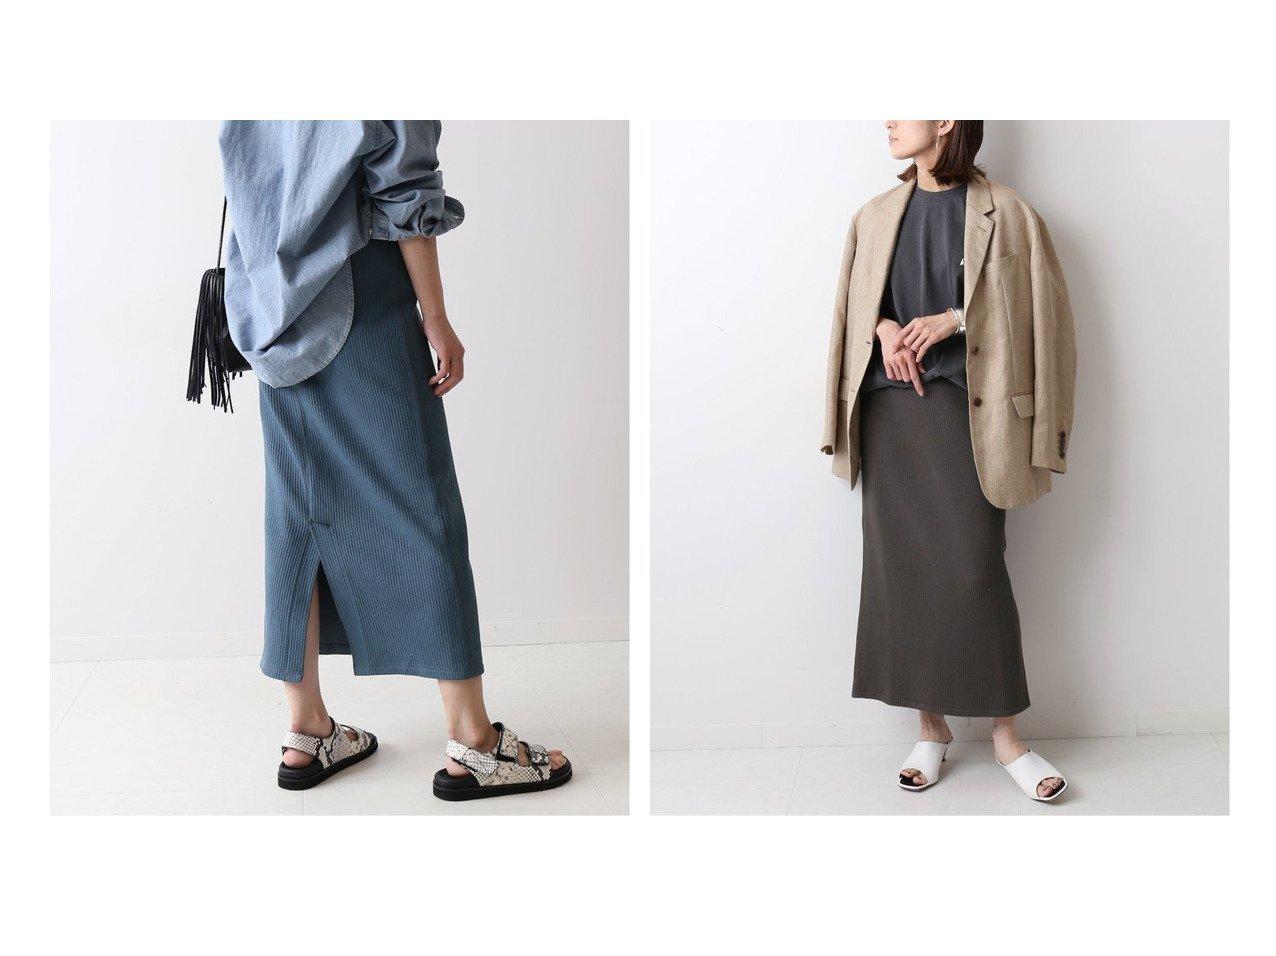 【FRAMeWORK/フレームワーク】のラゲットリブ スカート スカートのおすすめ!人気、トレンド・レディースファッションの通販 おすすめで人気の流行・トレンド、ファッションの通販商品 メンズファッション・キッズファッション・インテリア・家具・レディースファッション・服の通販 founy(ファニー) https://founy.com/ ファッション Fashion レディースファッション WOMEN スカート Skirt 2021年 2021 2021 春夏 S/S SS Spring/Summer 2021 S/S 春夏 SS Spring/Summer おすすめ Recommend セットアップ タイトスカート リラックス 再入荷 Restock/Back in Stock/Re Arrival  ID:crp329100000023294